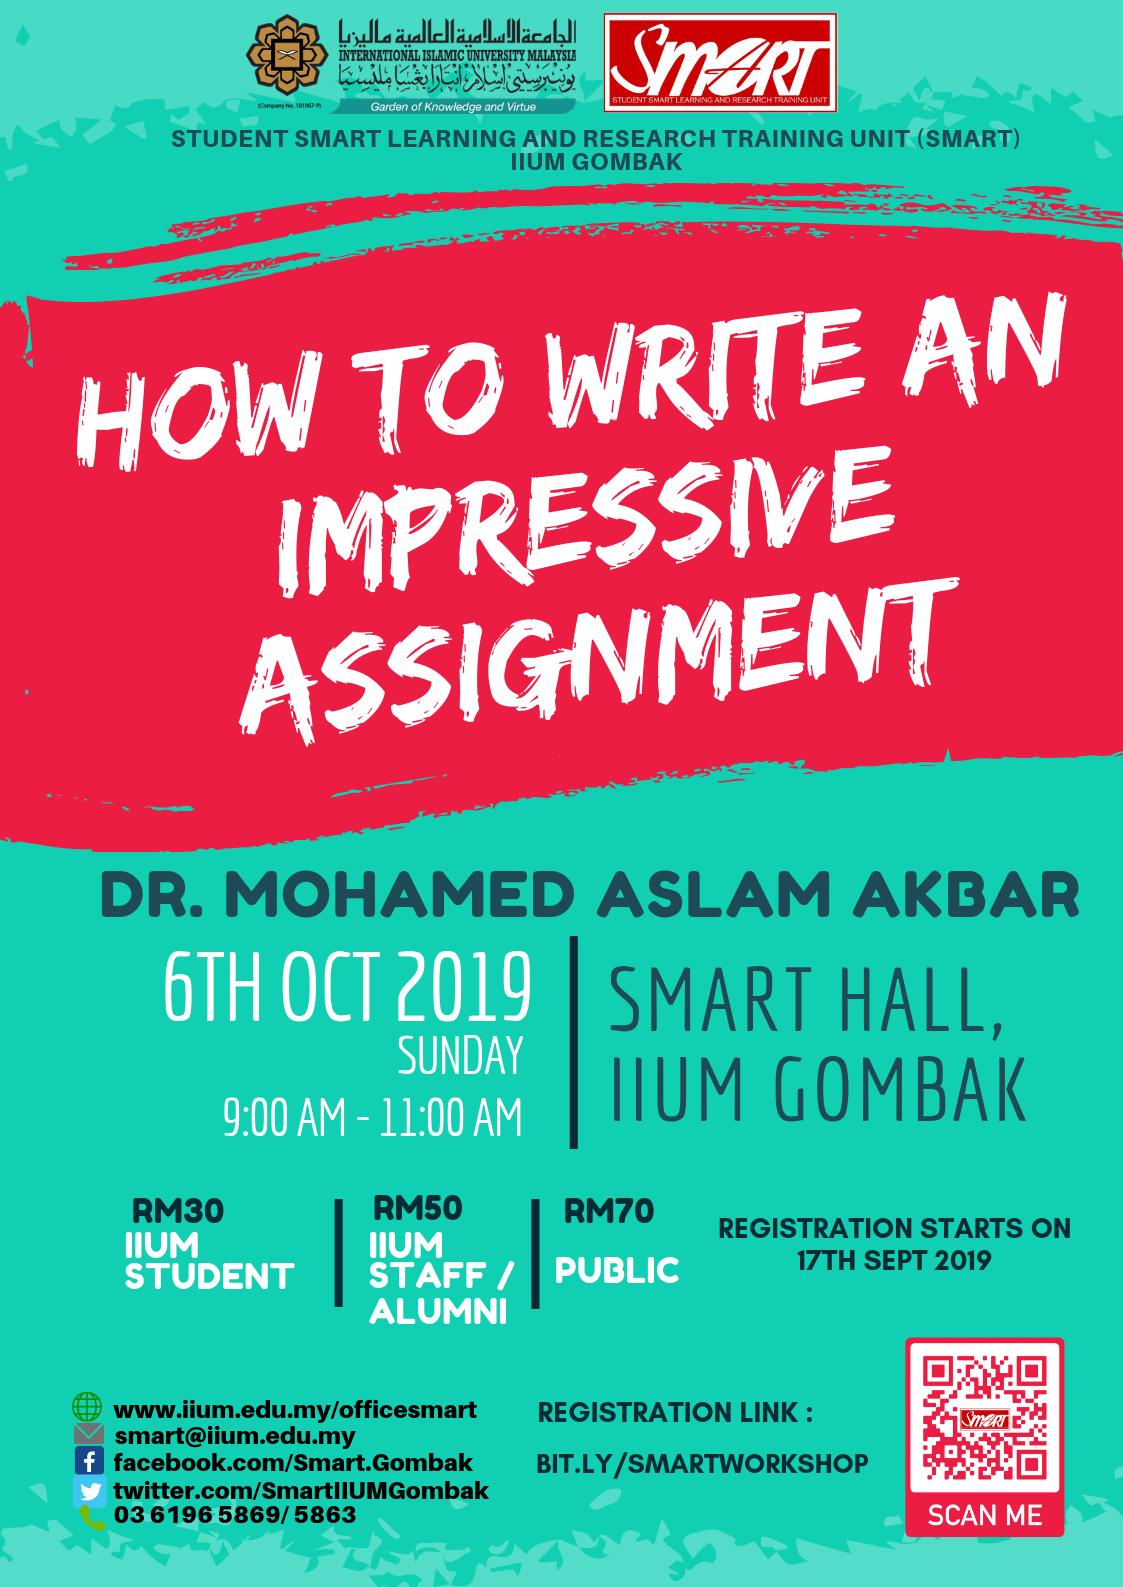 SEM 1, 19/20 - WORKSHOP - HOW TO WRITE AN IMPRESSIVE ASSIGNMENT